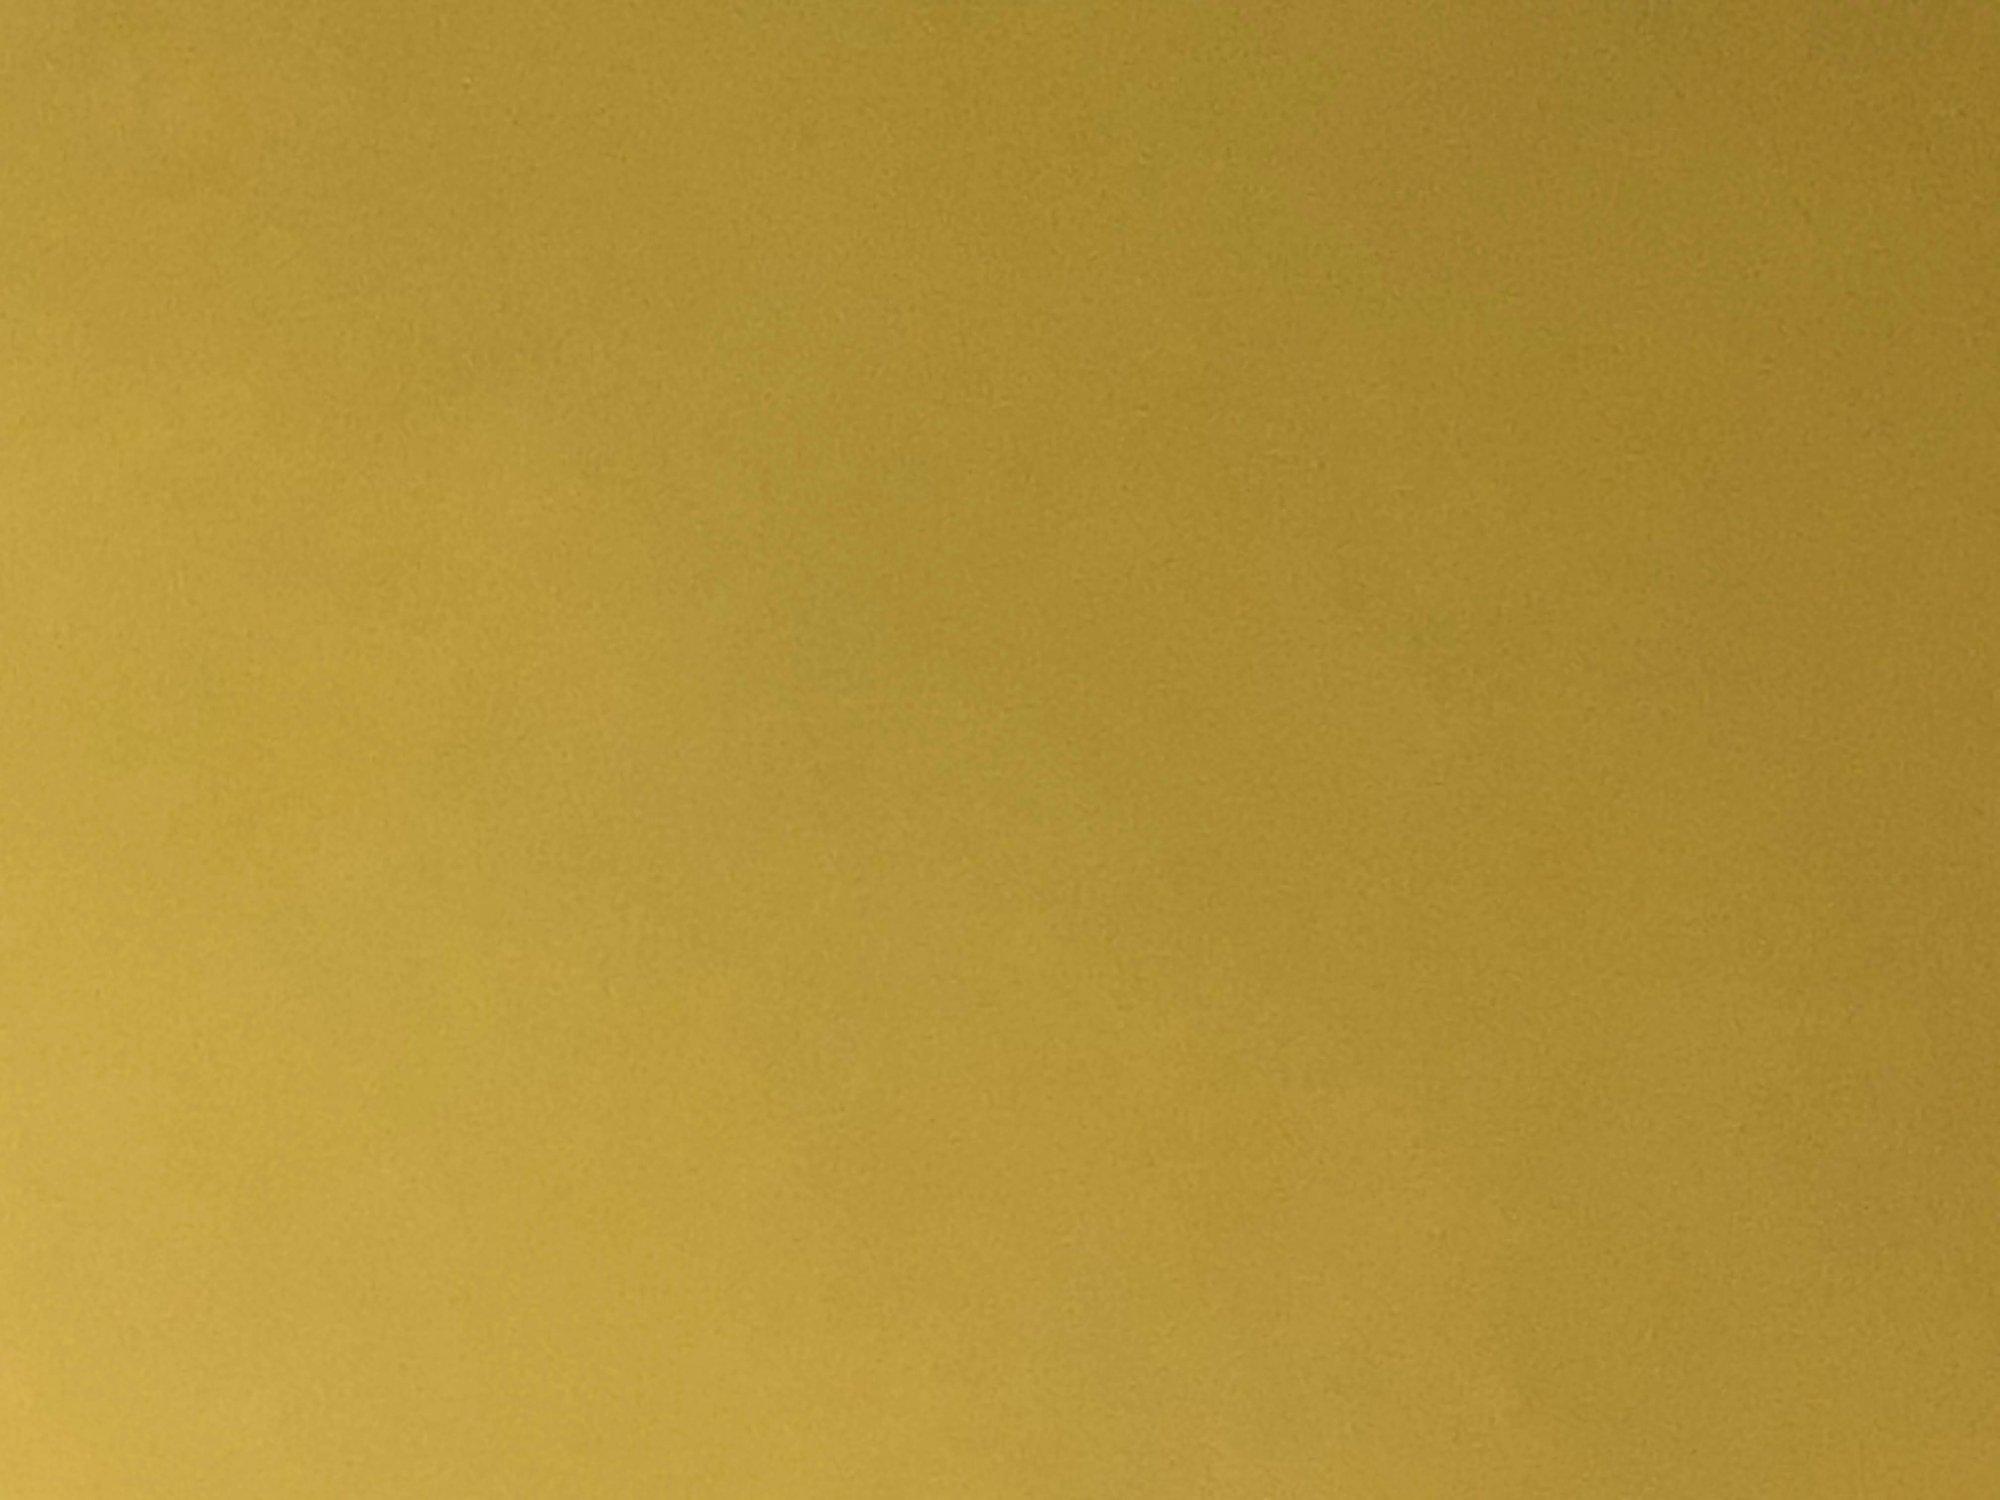 Stahls' Gold Fashion-Film Heat Transfer Vinyl 12 x 15